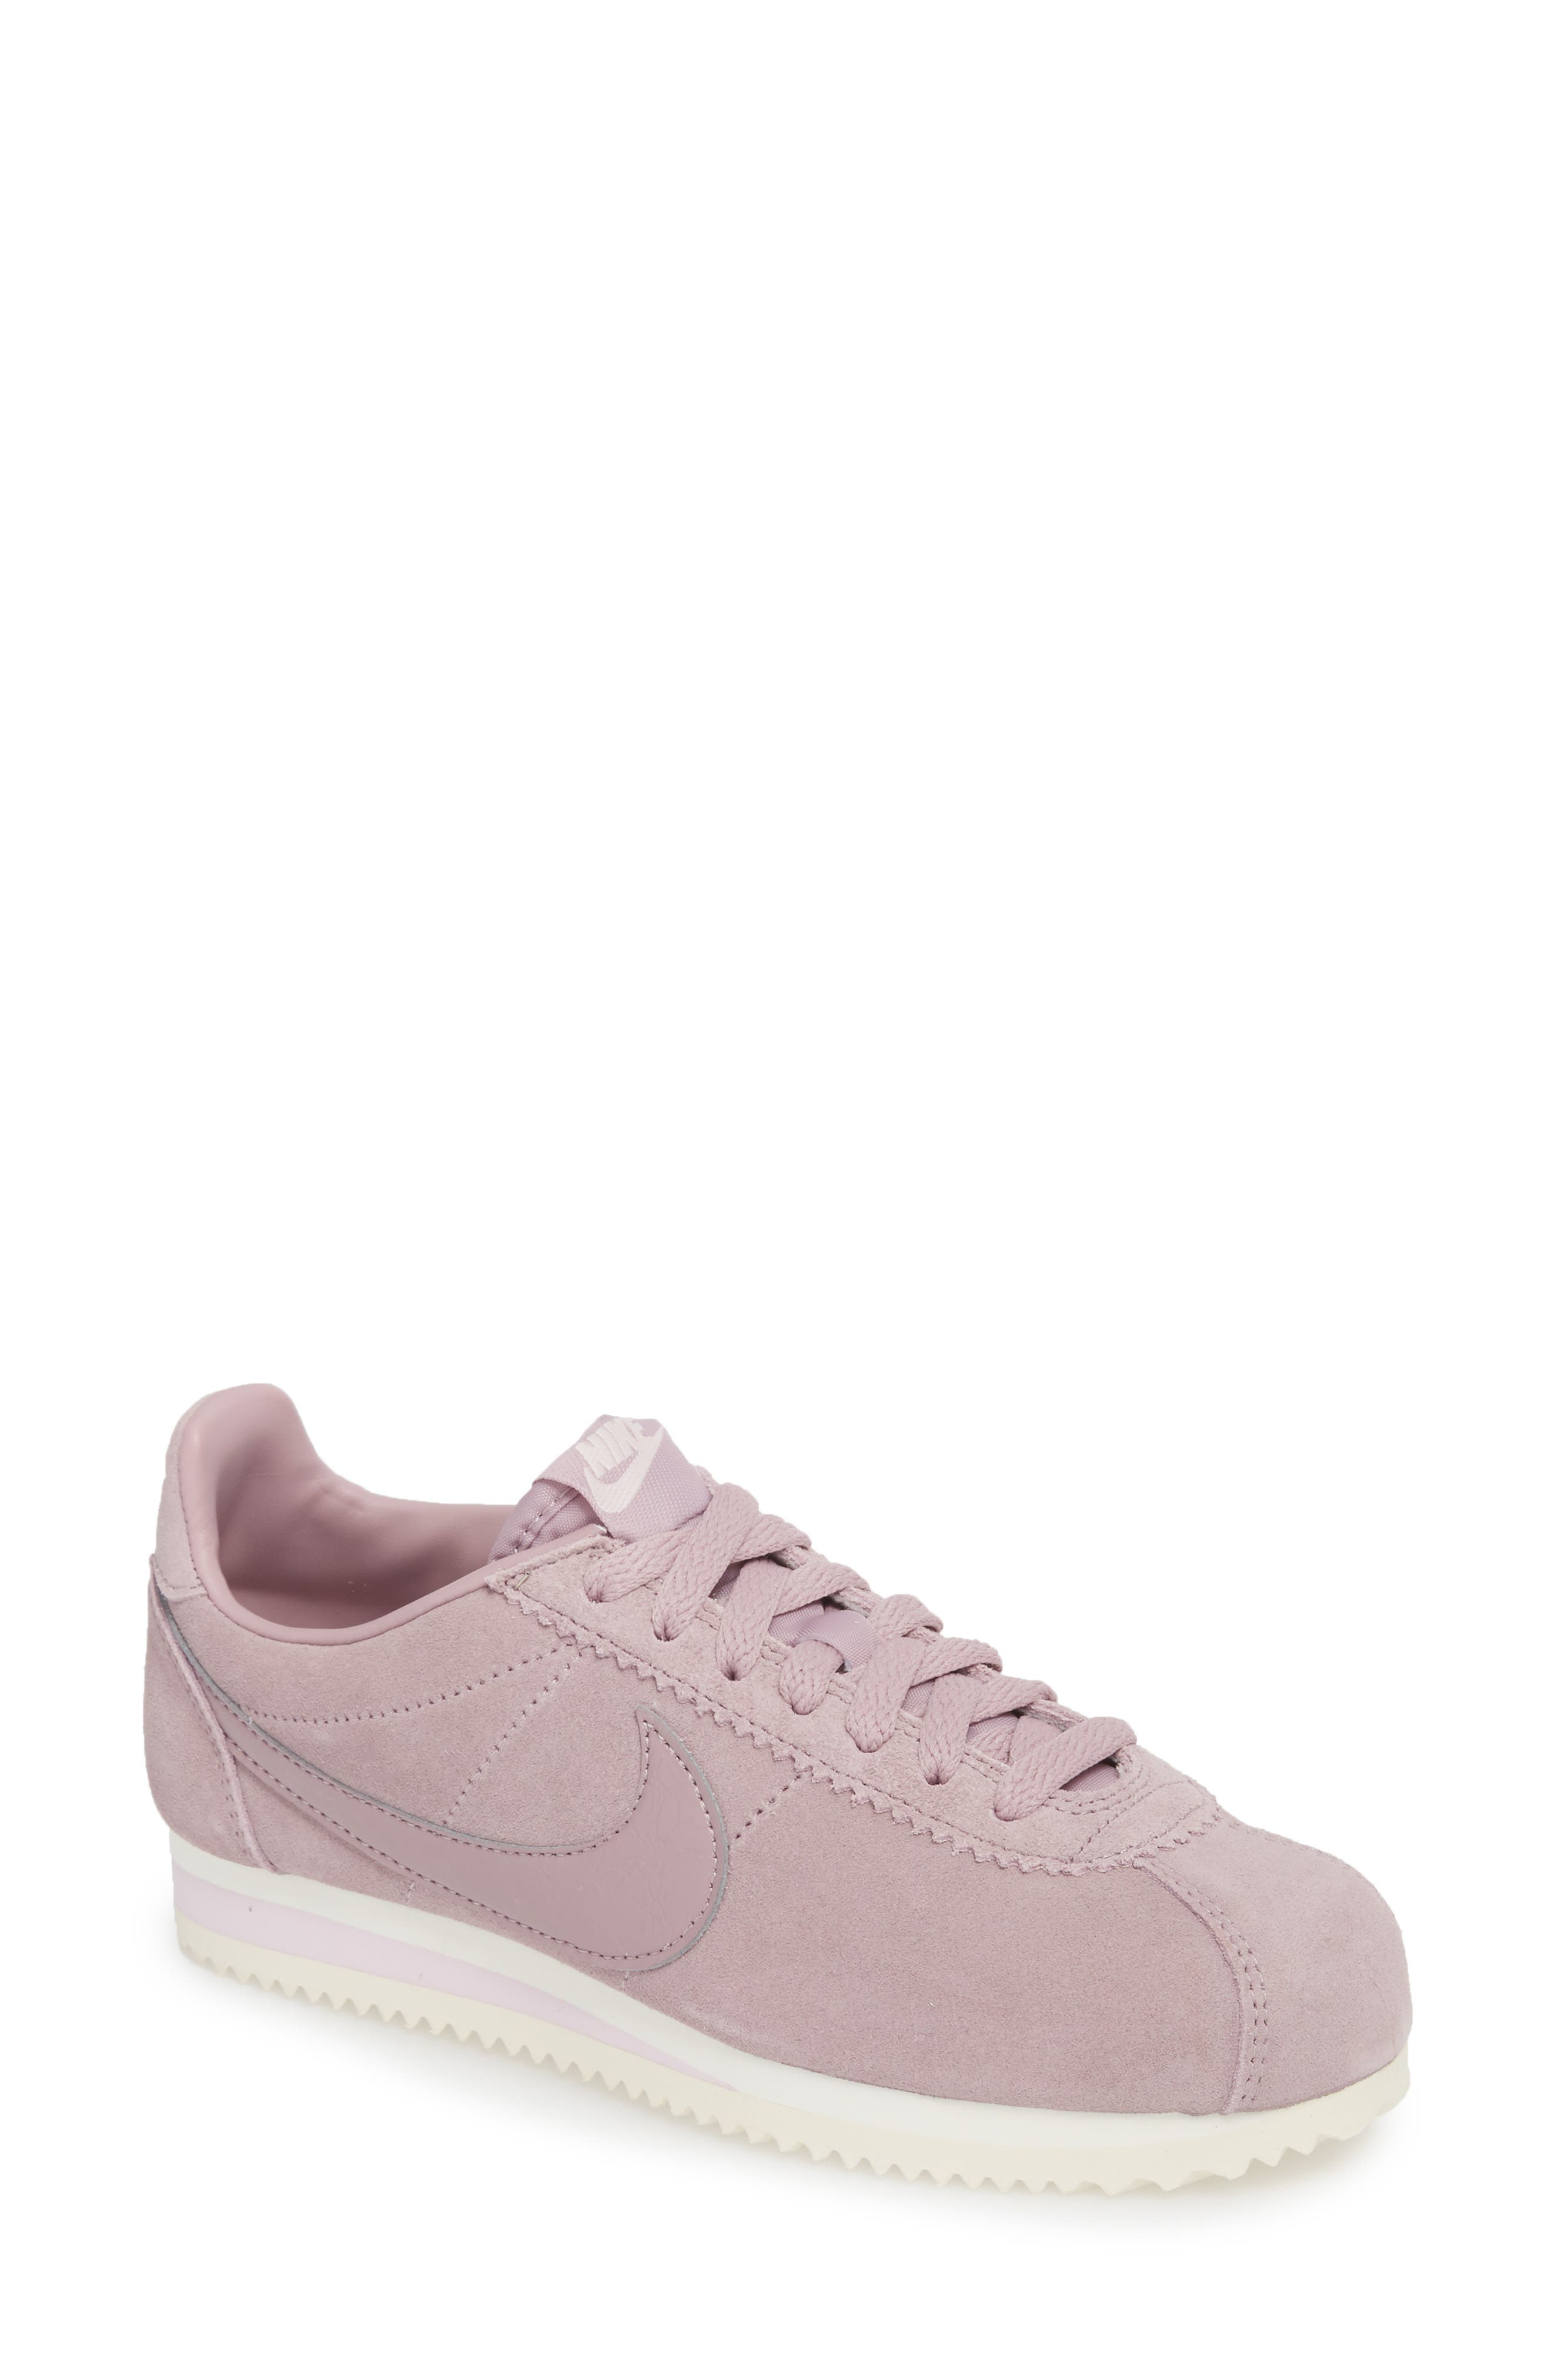 NIKE,                             Classic Cortez Suede Sneaker,                             Main thumbnail 1, color,                             650